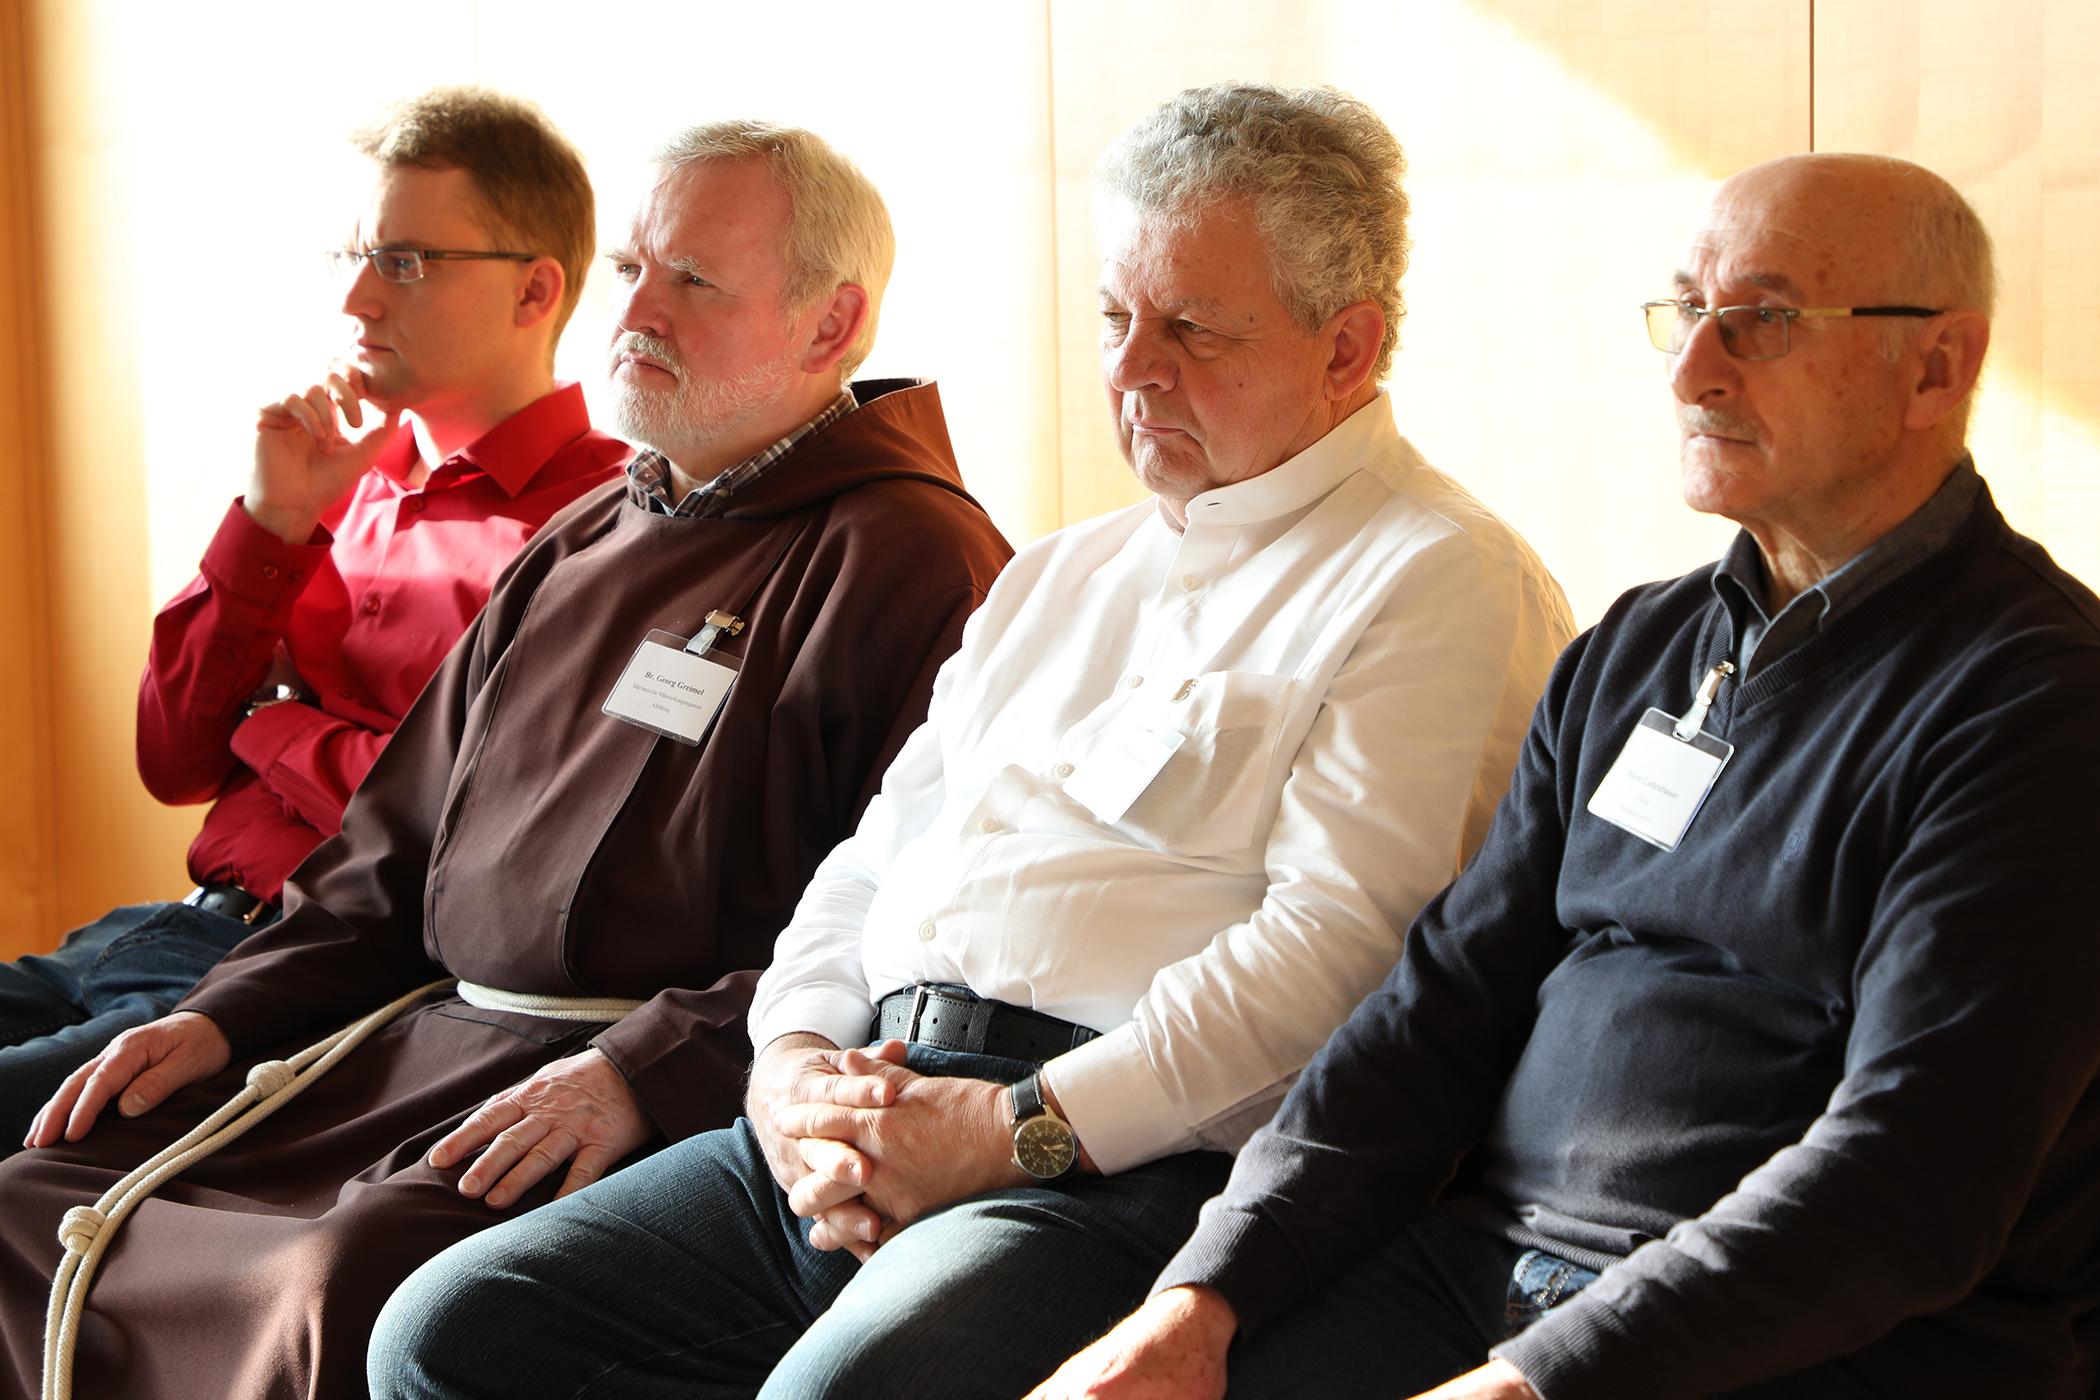 190220_News_Bundeskonferenz-Maennerseelsorge-foto4